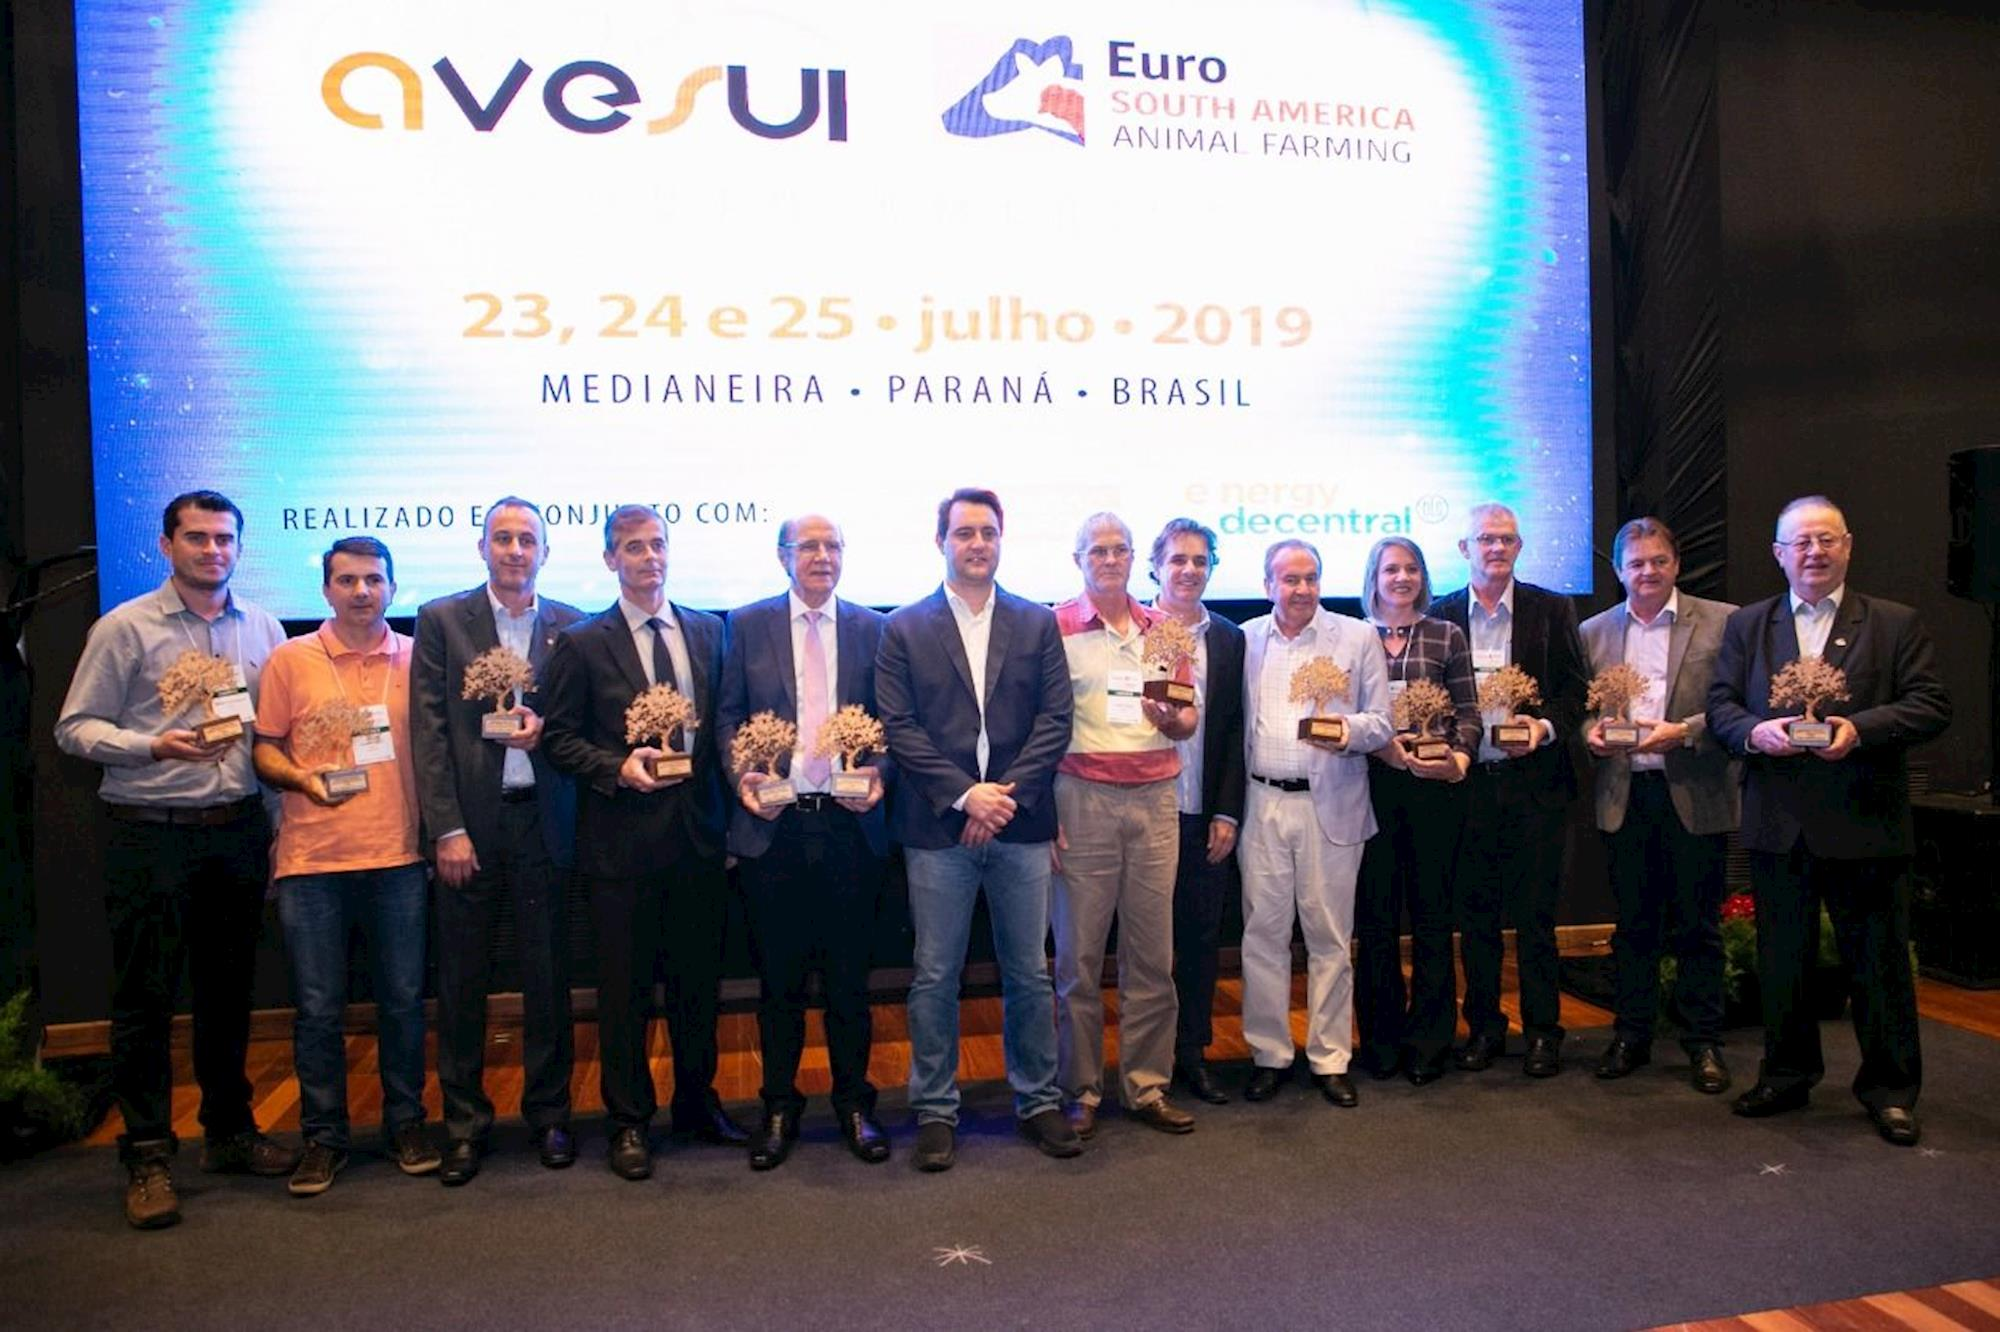 ÁLBUM DE FOTOS - Confira o primeiro dia da AveSui EuroTier